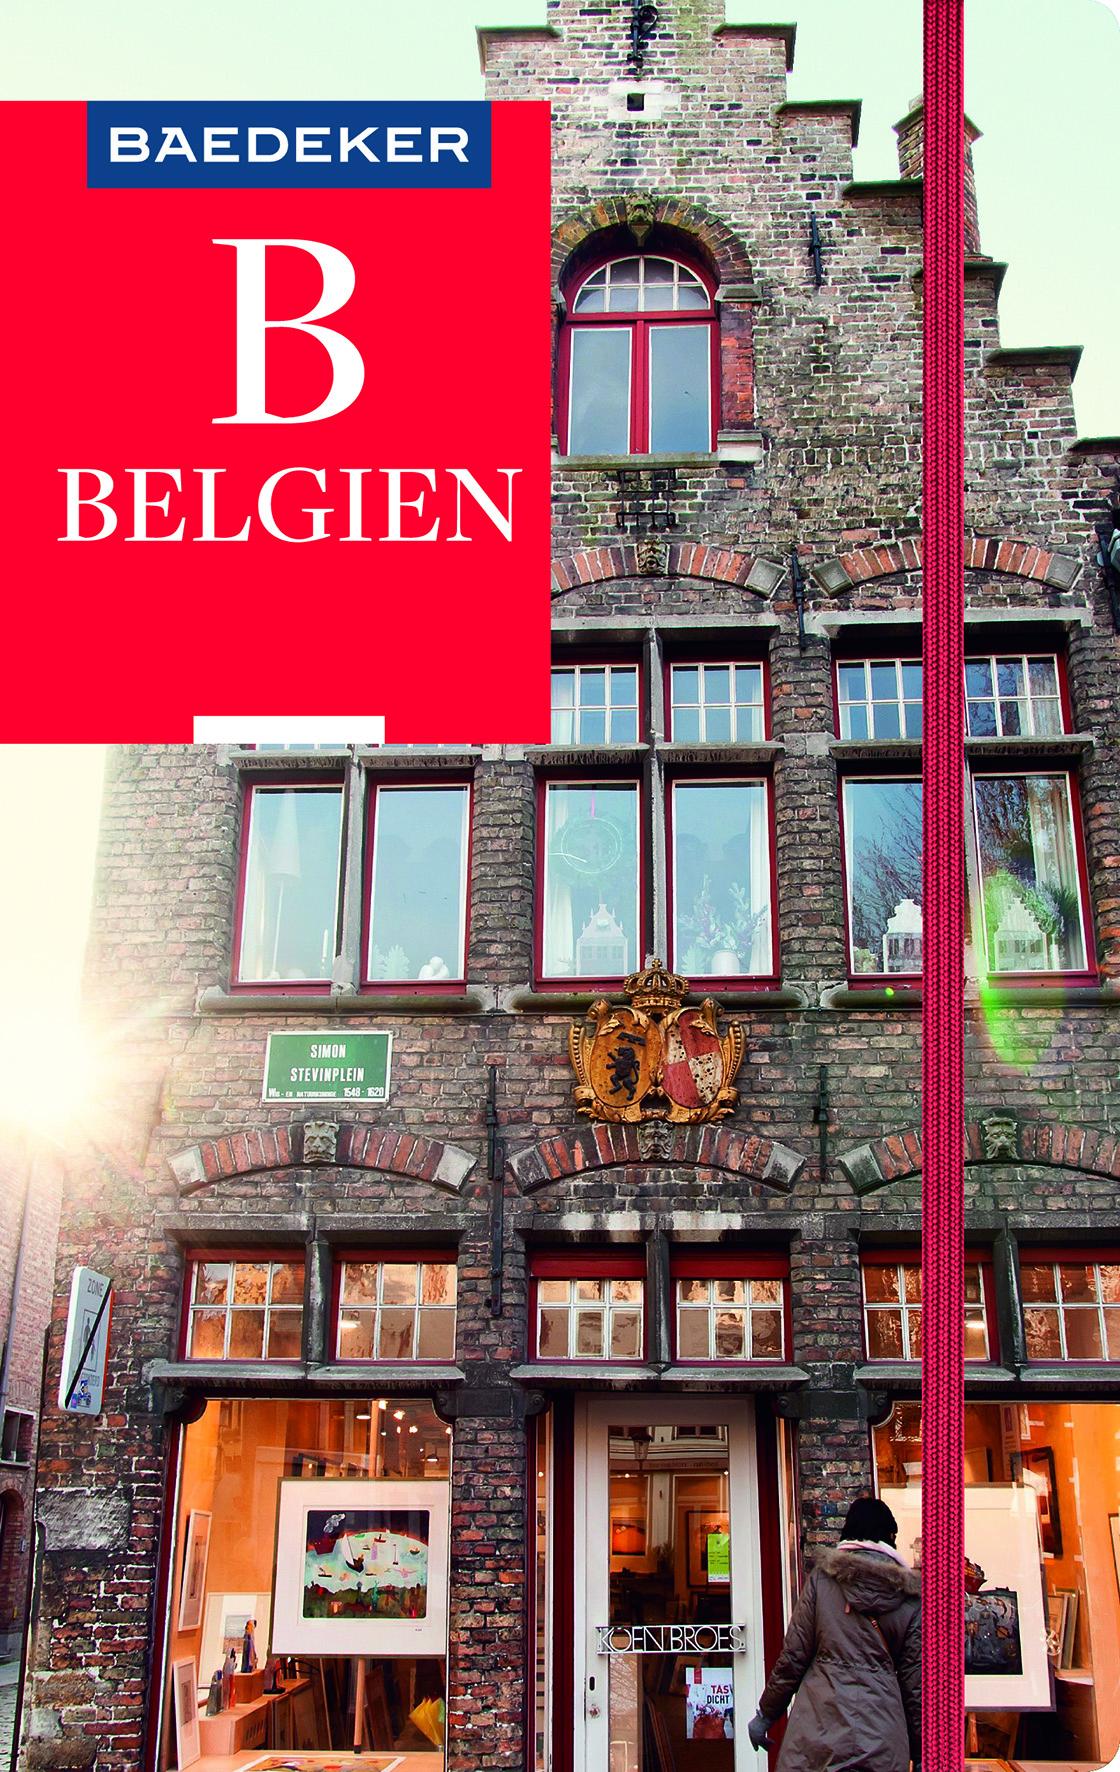 Baedeker - Belgien (Cover)